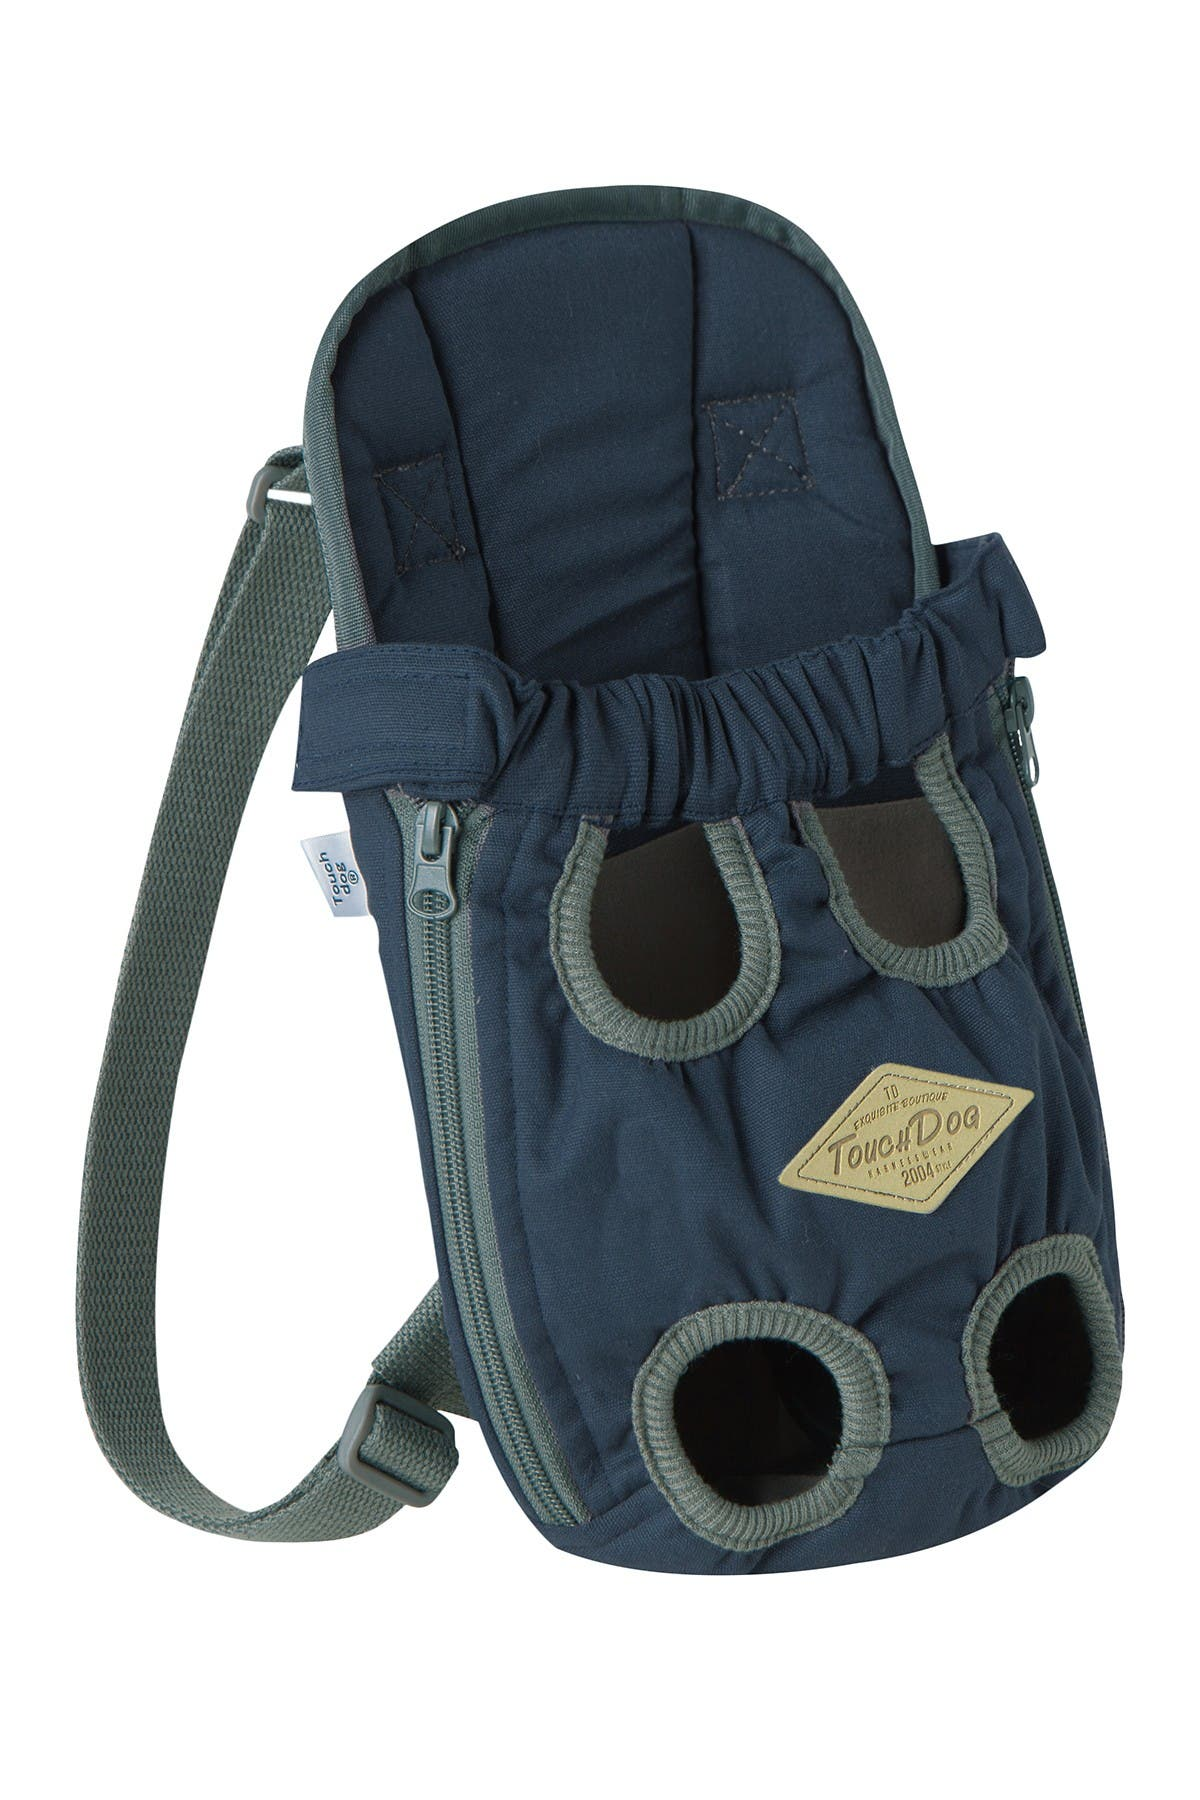 Image of Pet Life Touchdog 'Wiggle-Sack' Fashion Designer Front & Backpack Dog Carrier - Small